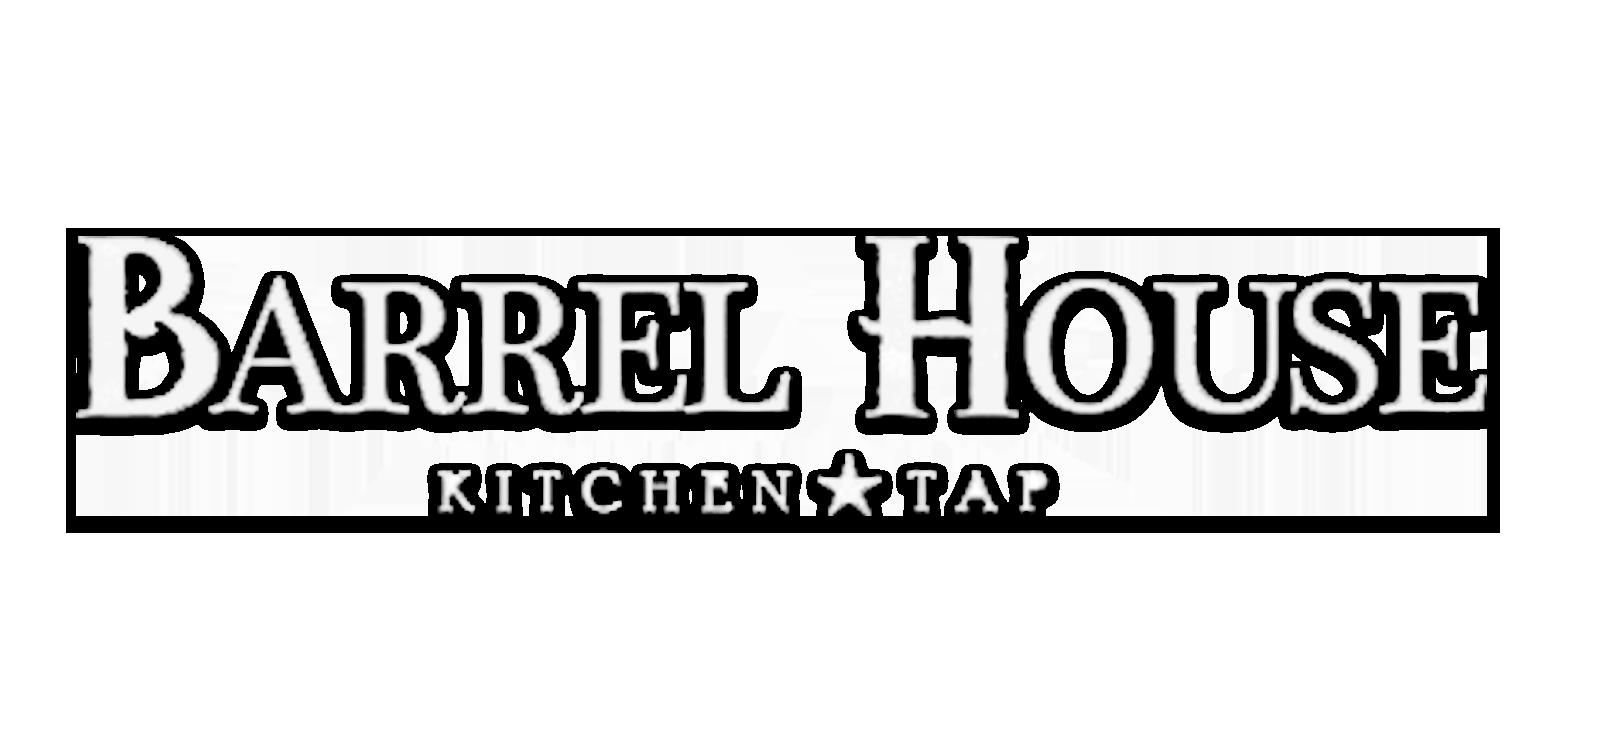 Barrel House Kitchen & Tap Logo